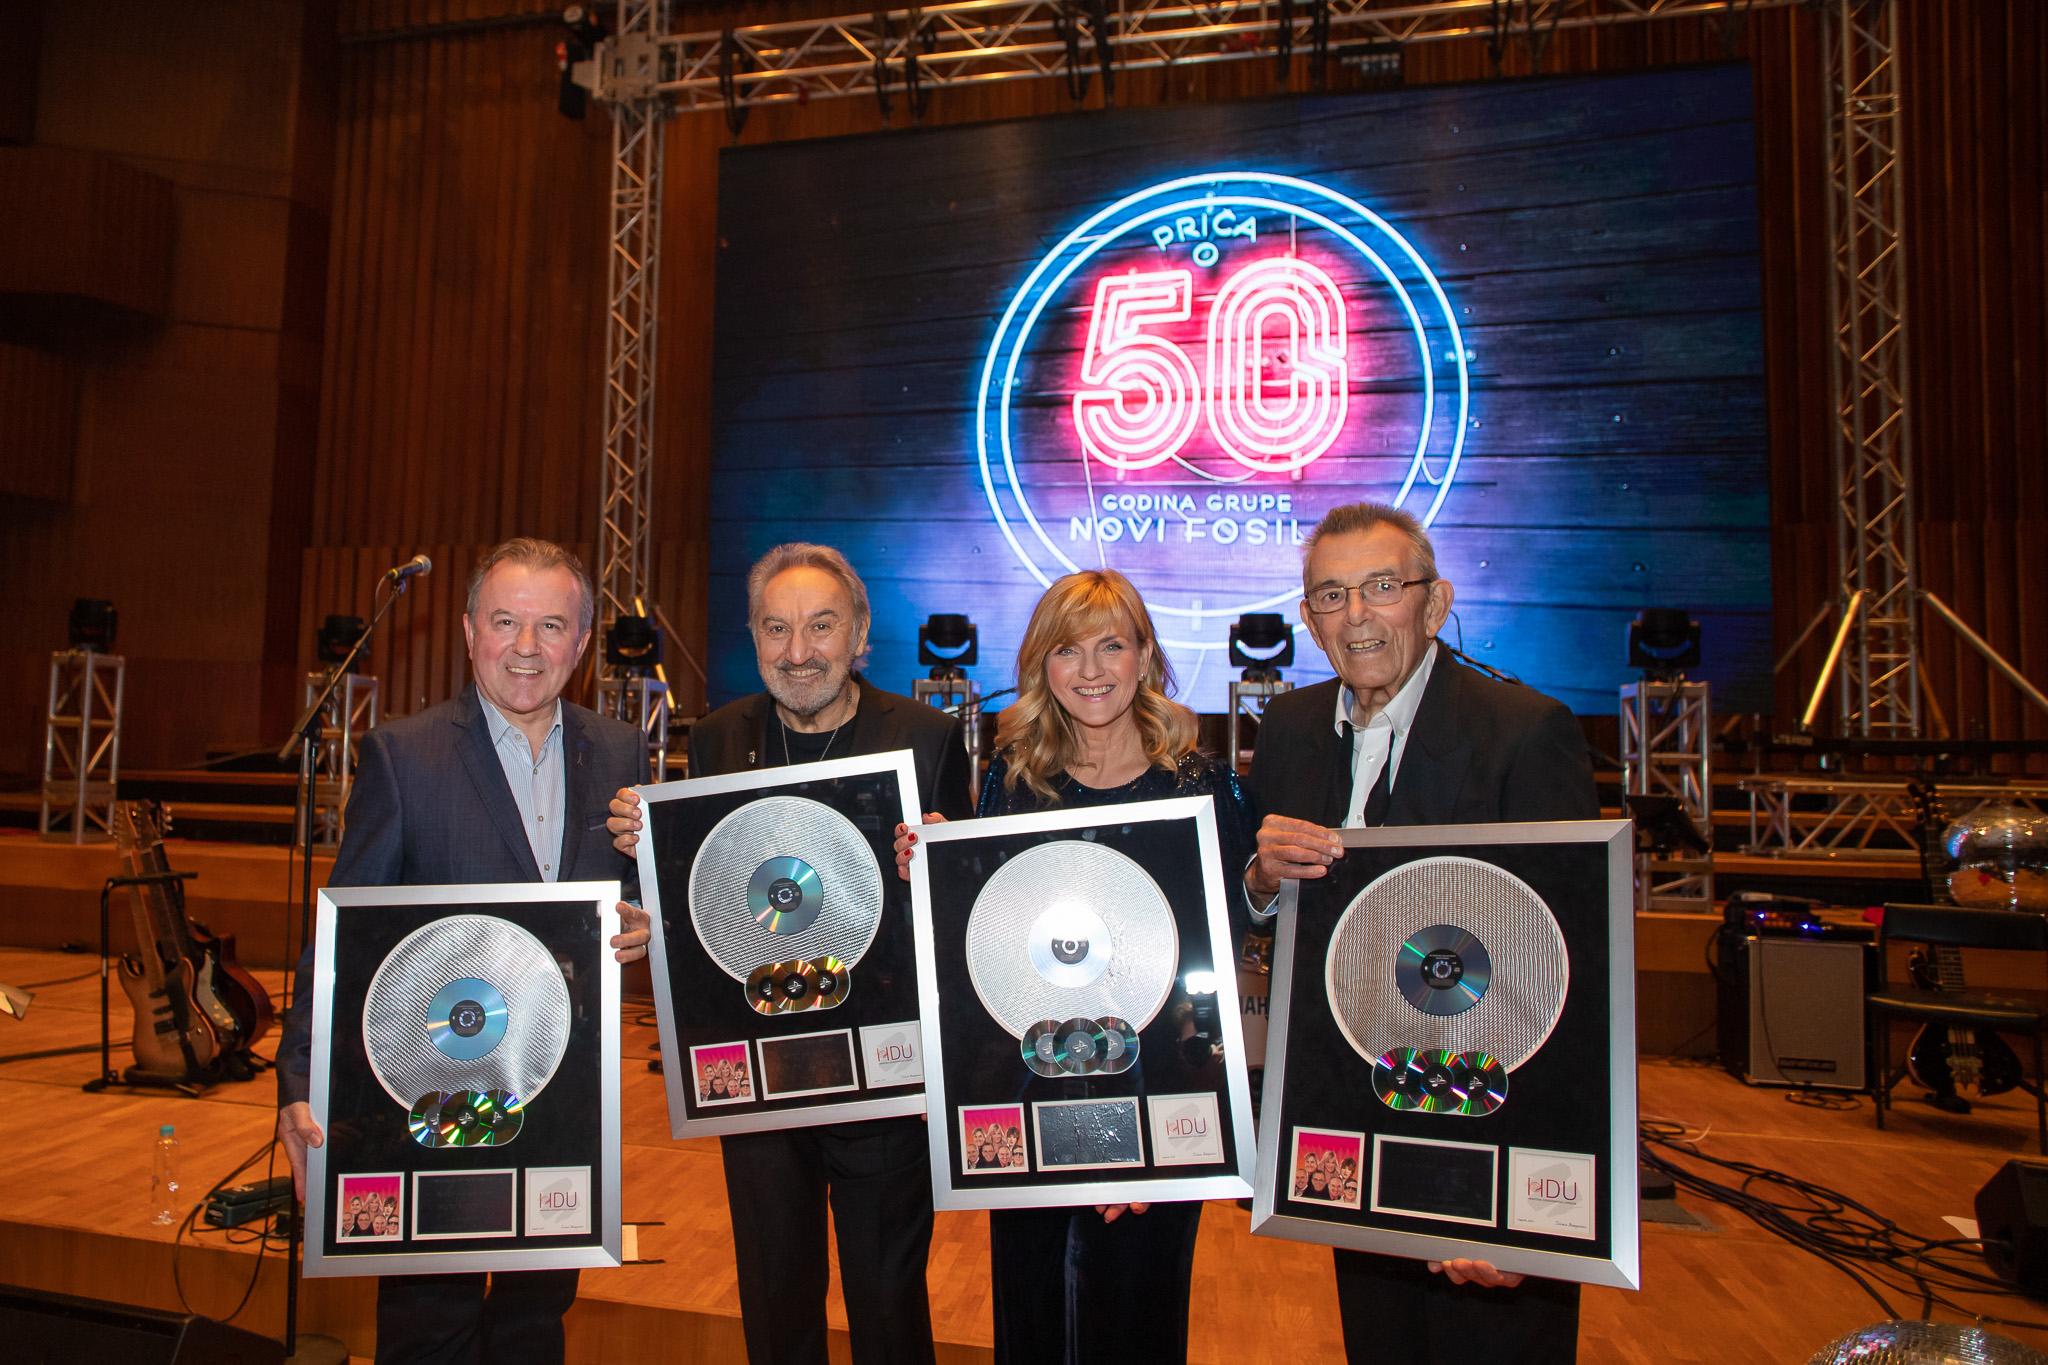 Novi fosili s dva koncerta u Lisinskom proslavili 50 godina i dobili Multi-platinum award HDU-a